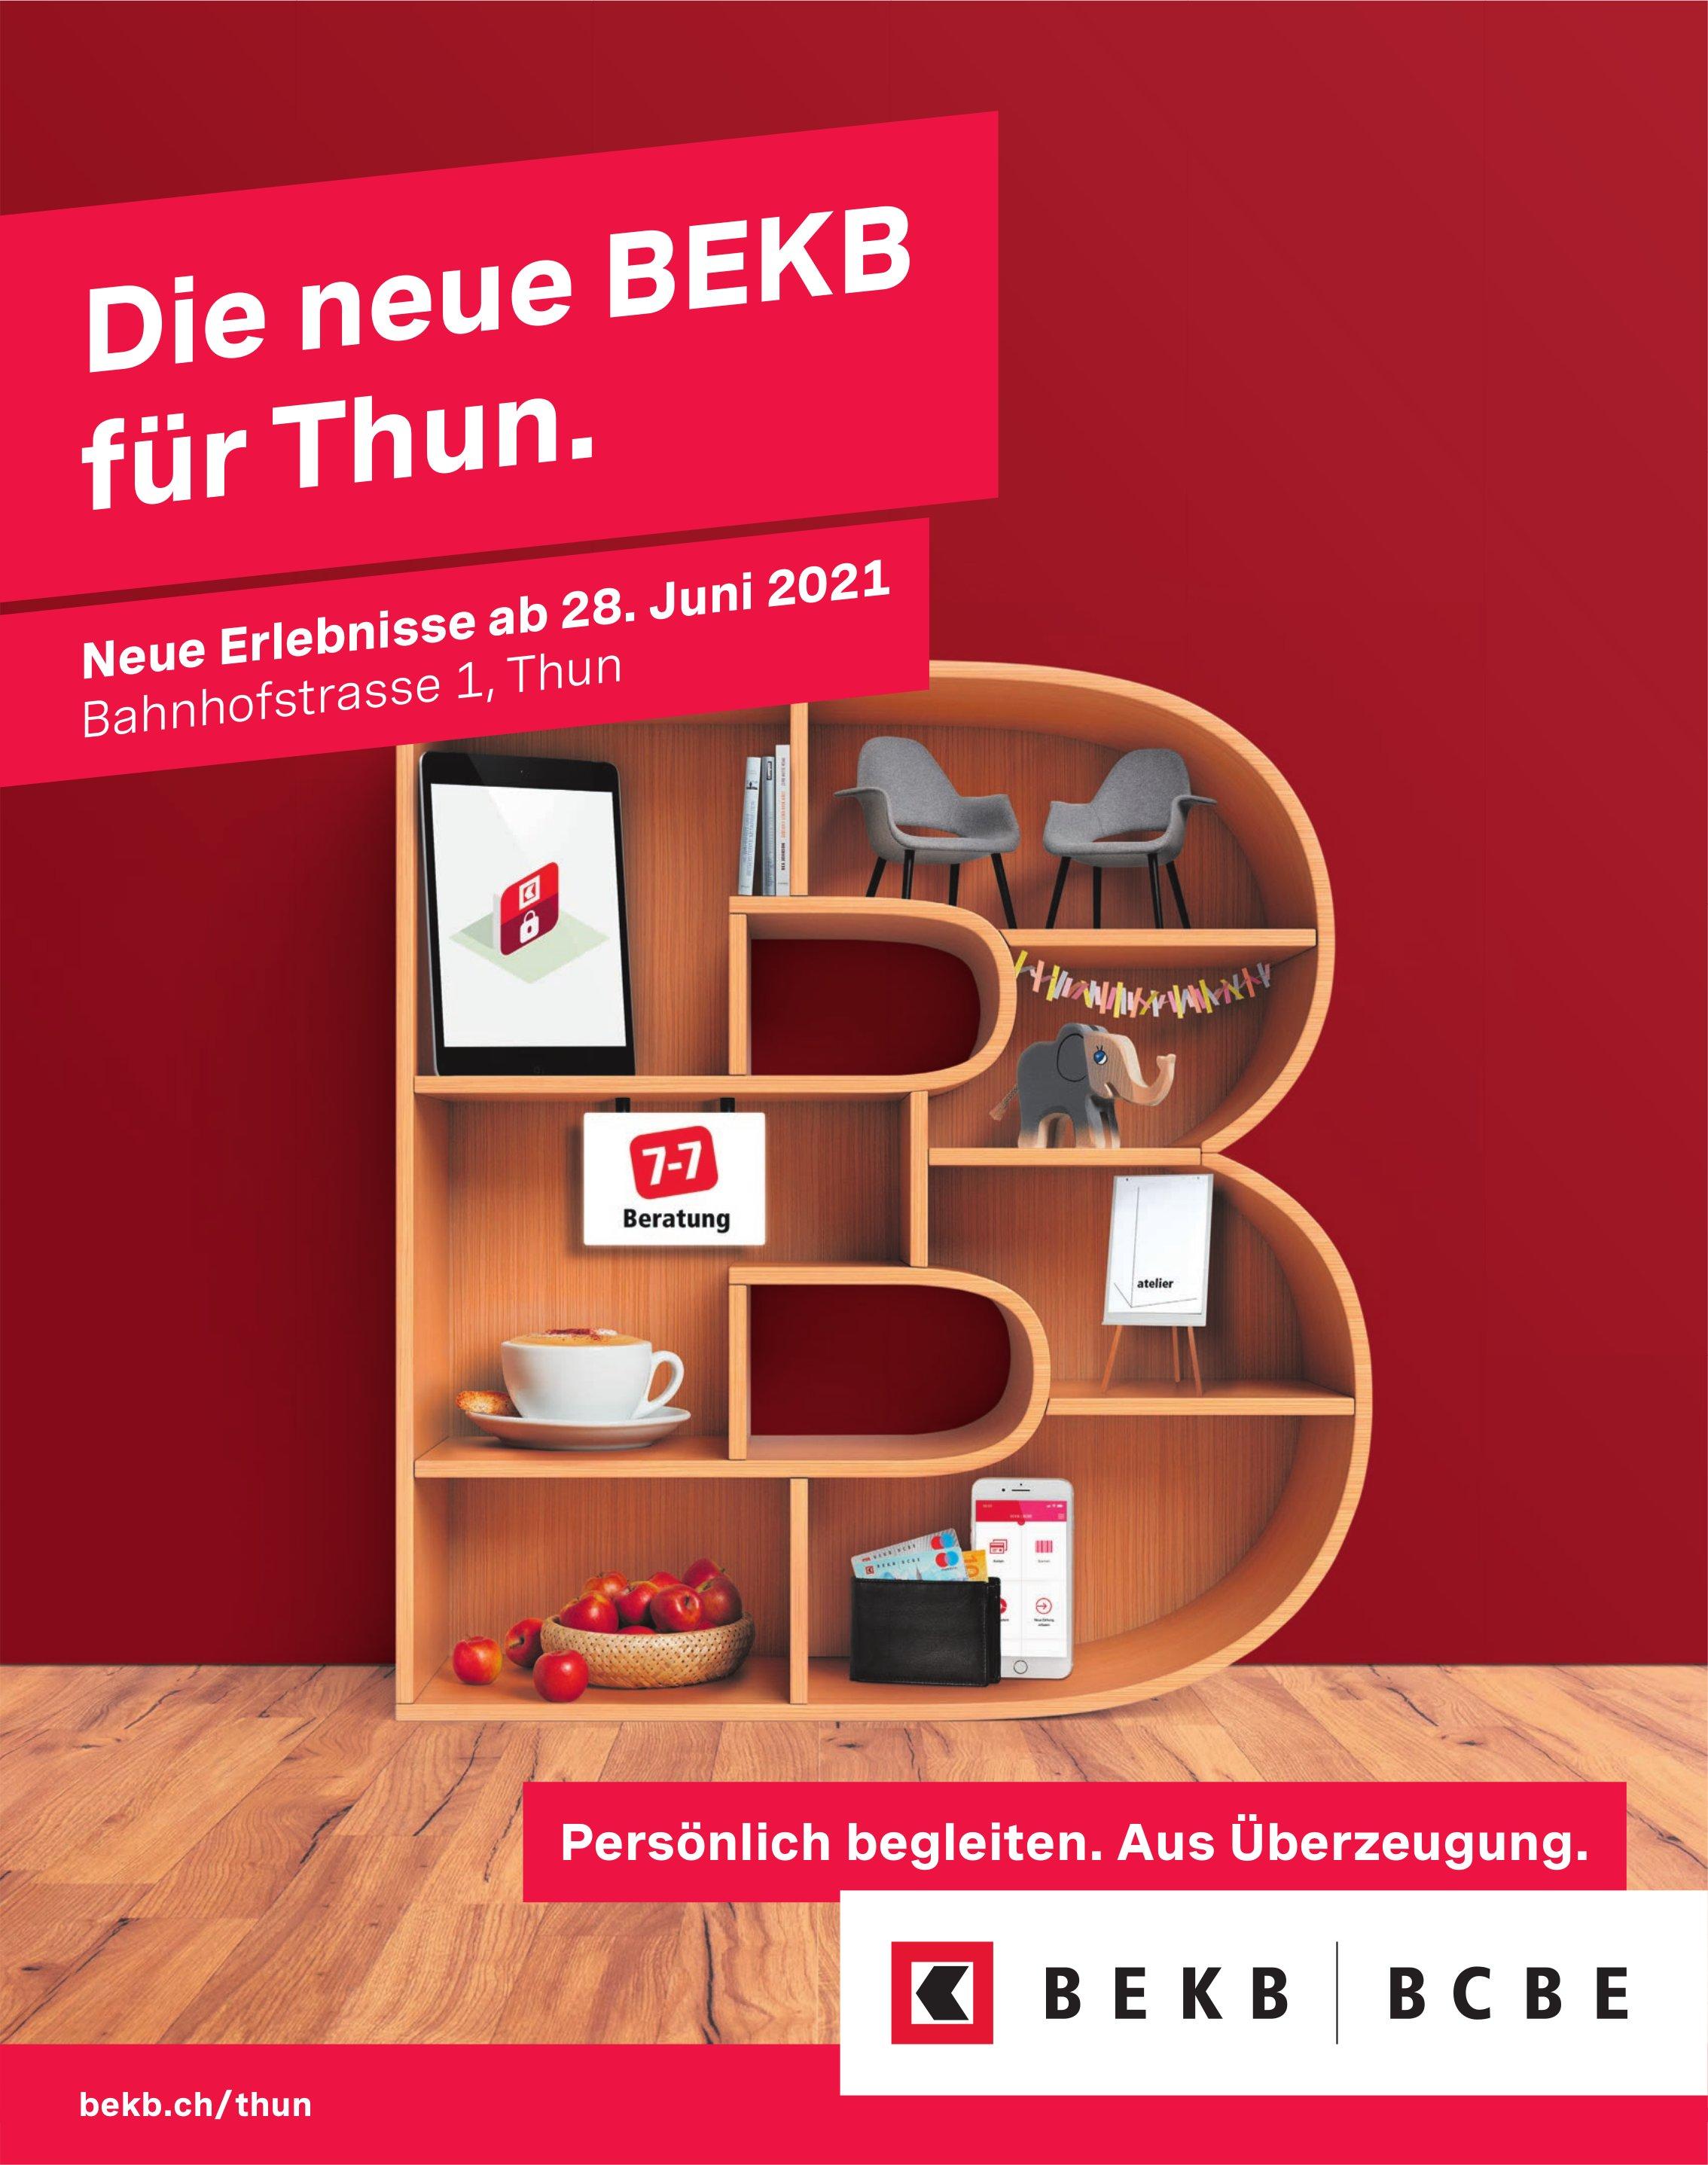 Die neue BEKB, Thun